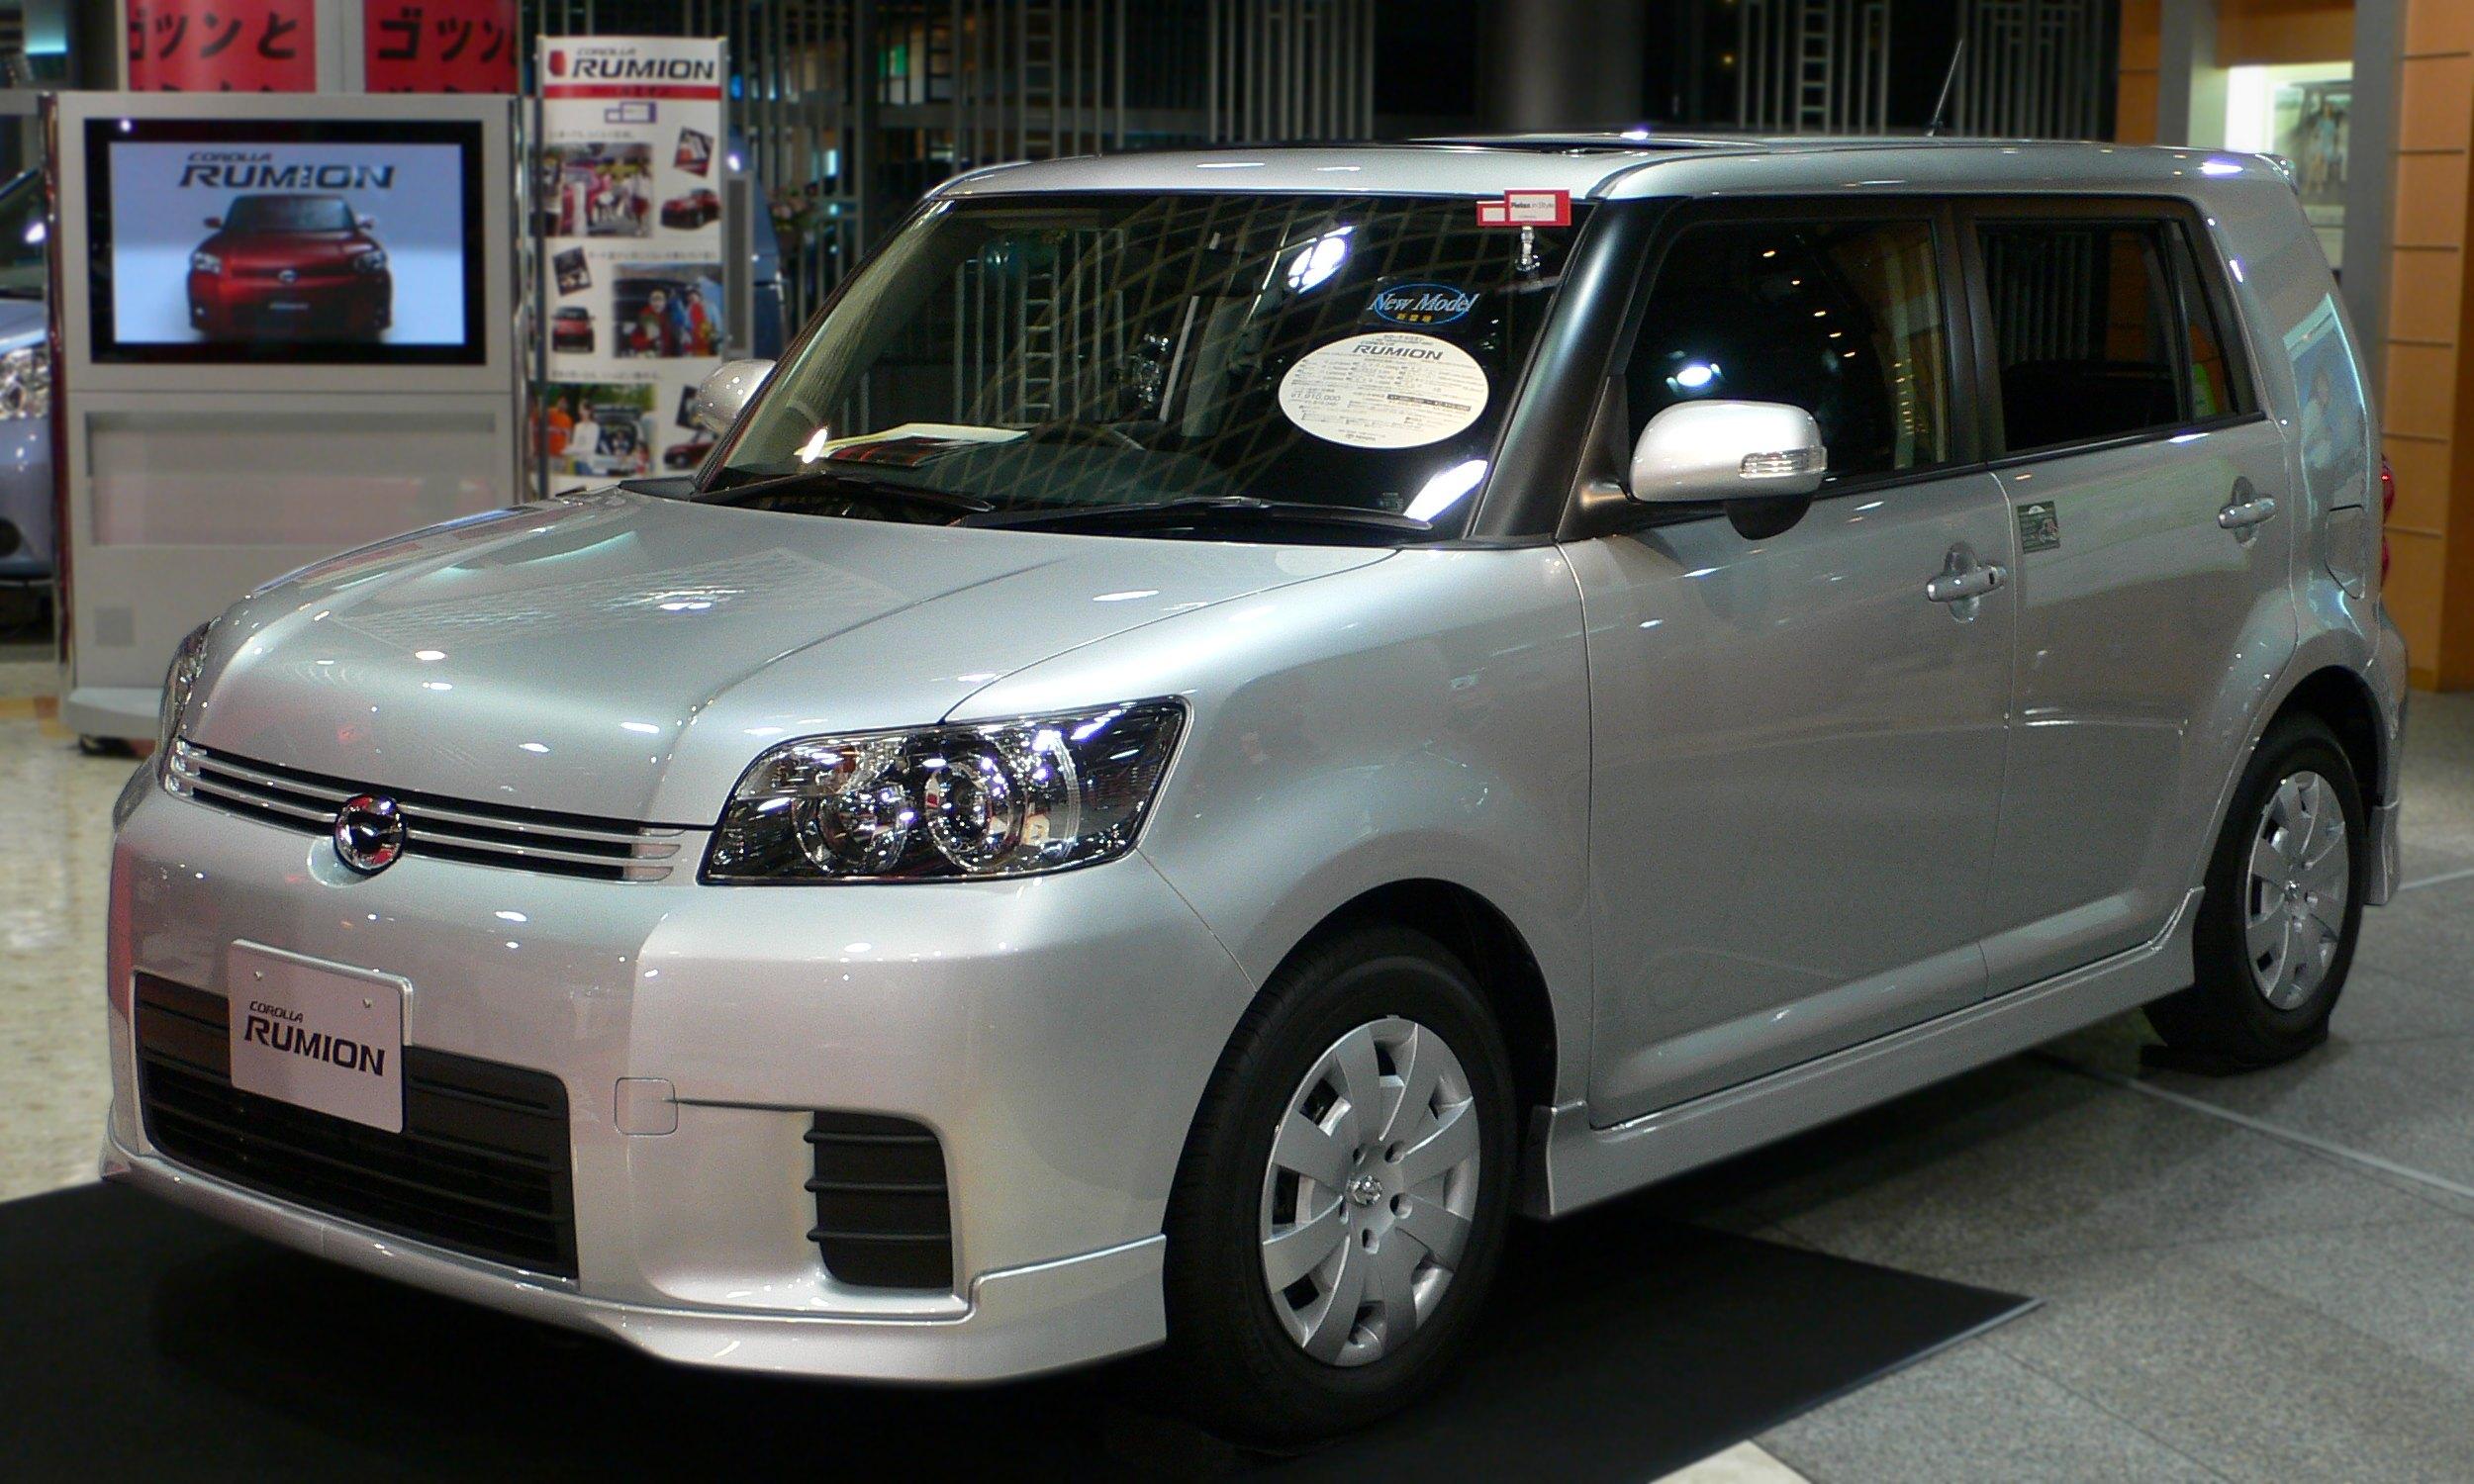 Toyota Corolla Rumion 2007 - now Station wagon 5 door #5